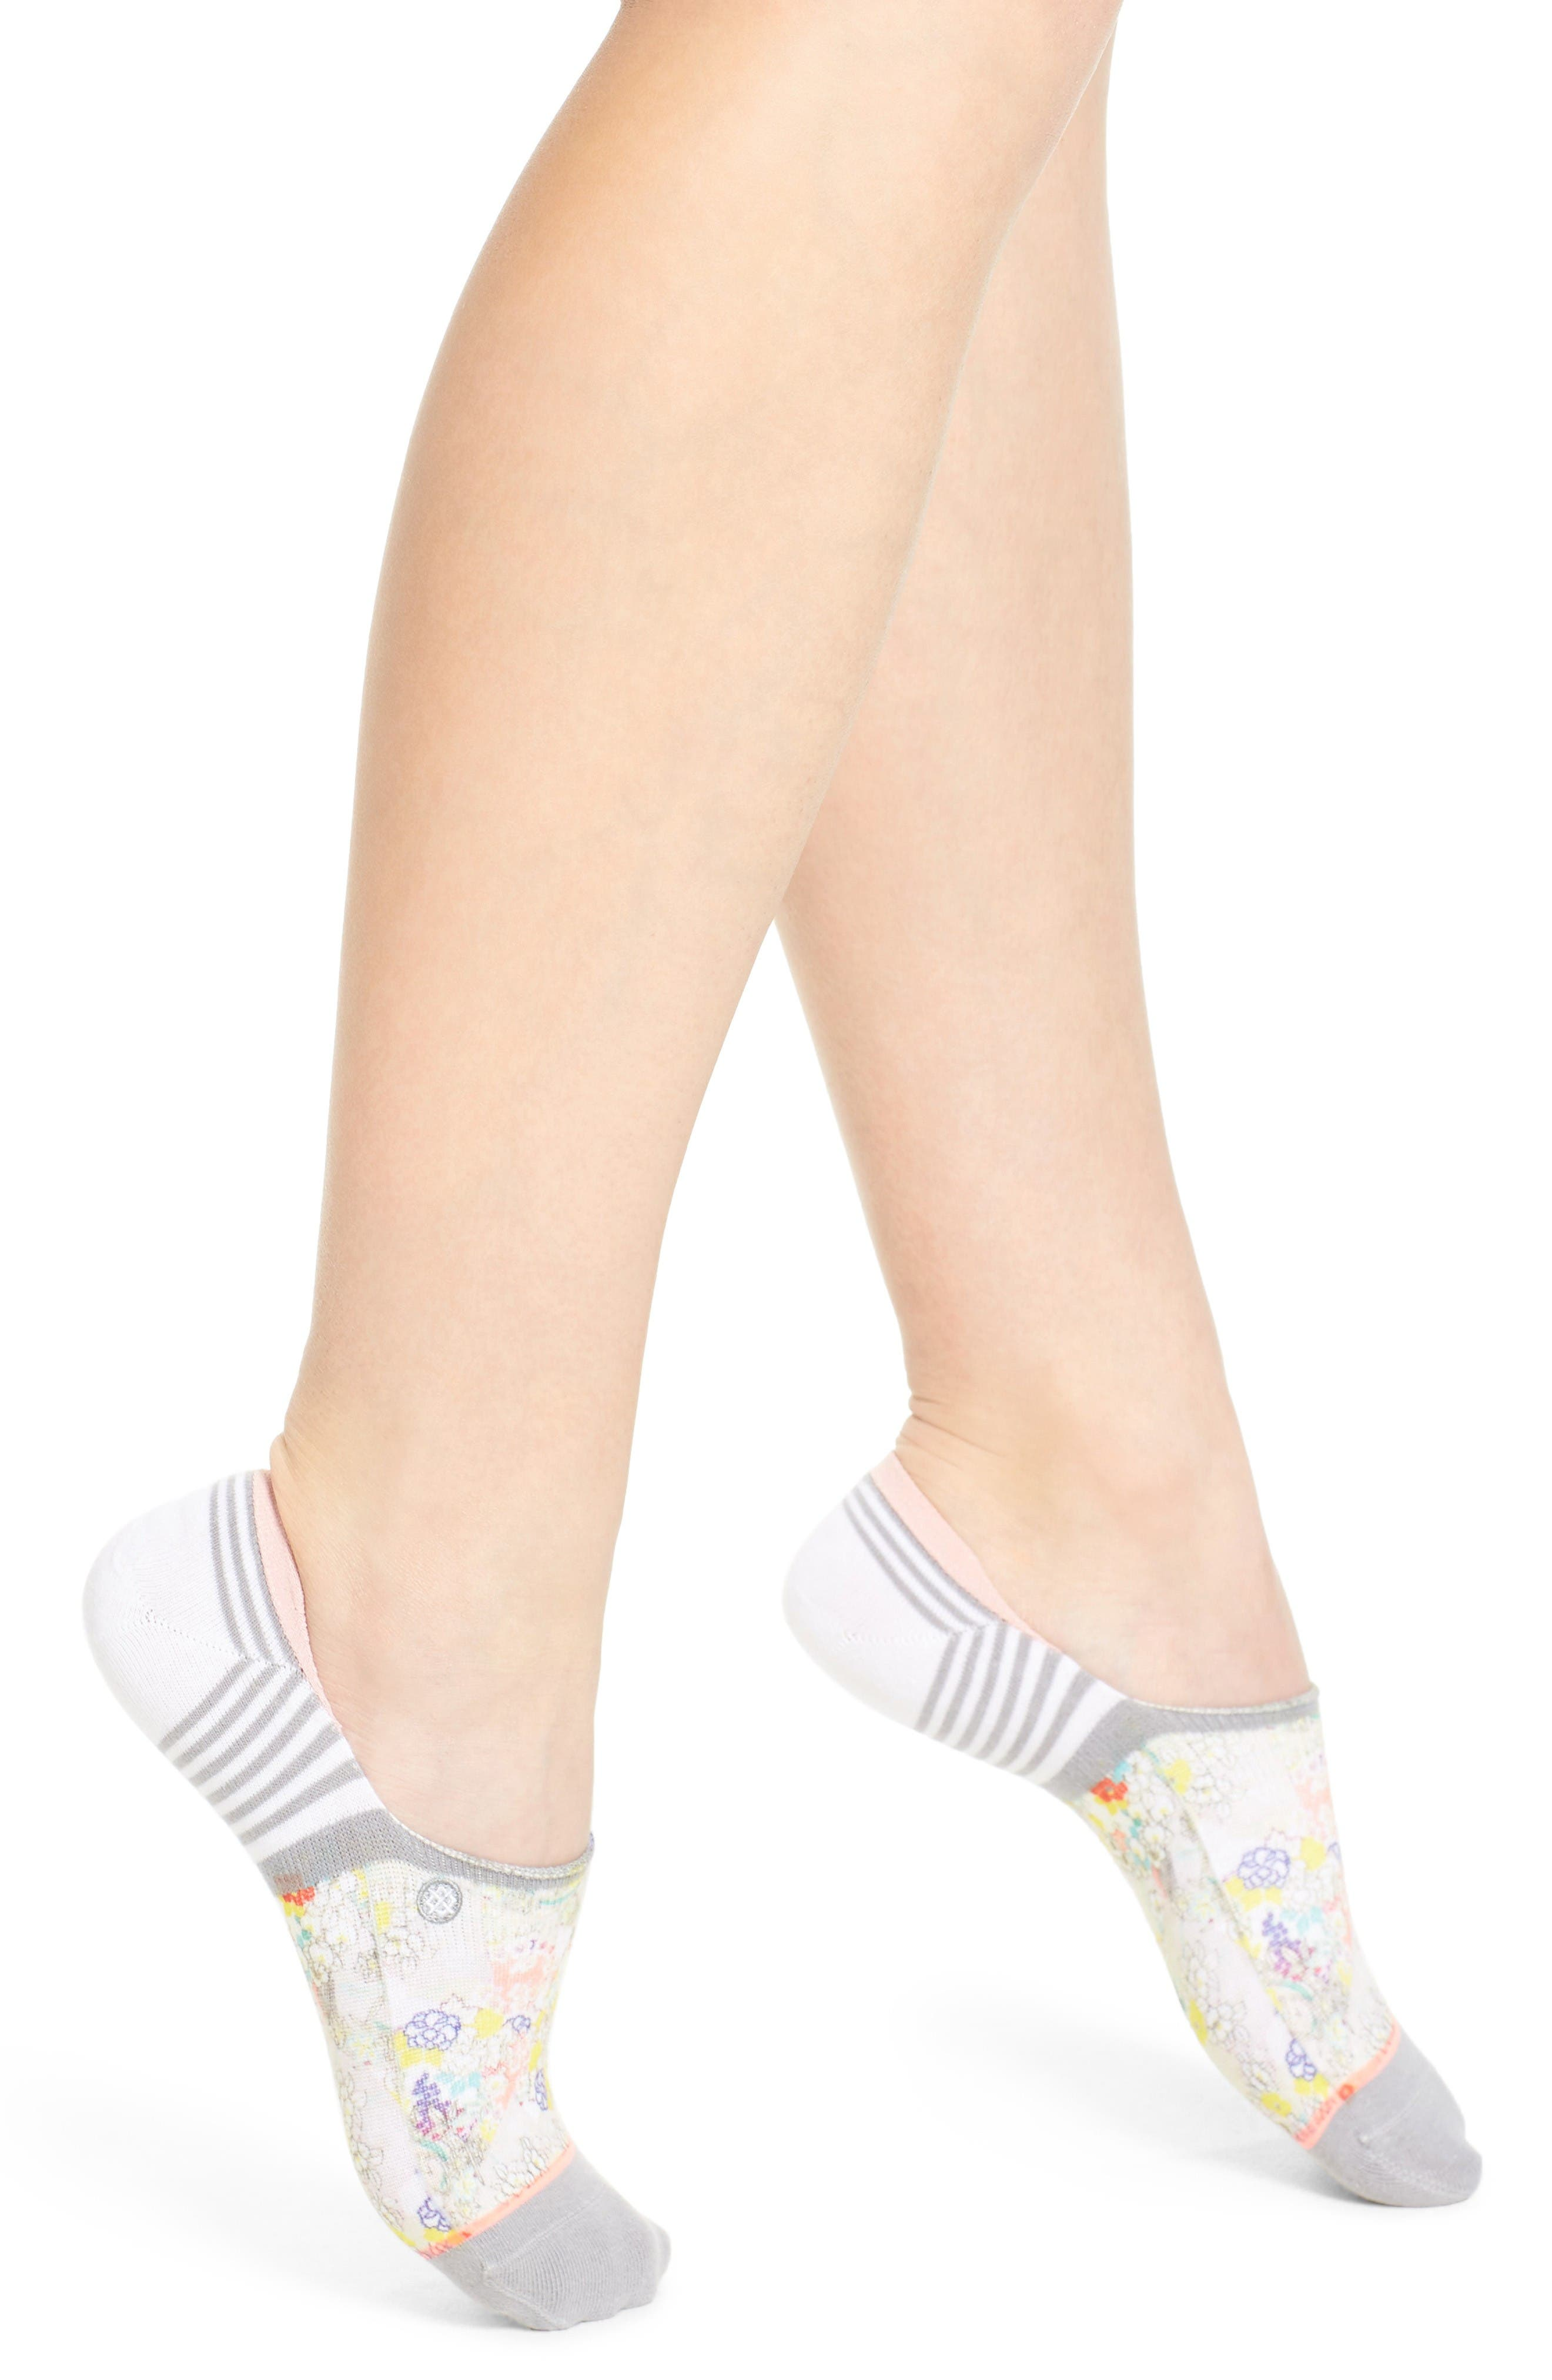 Stance Castella Ankle Socks